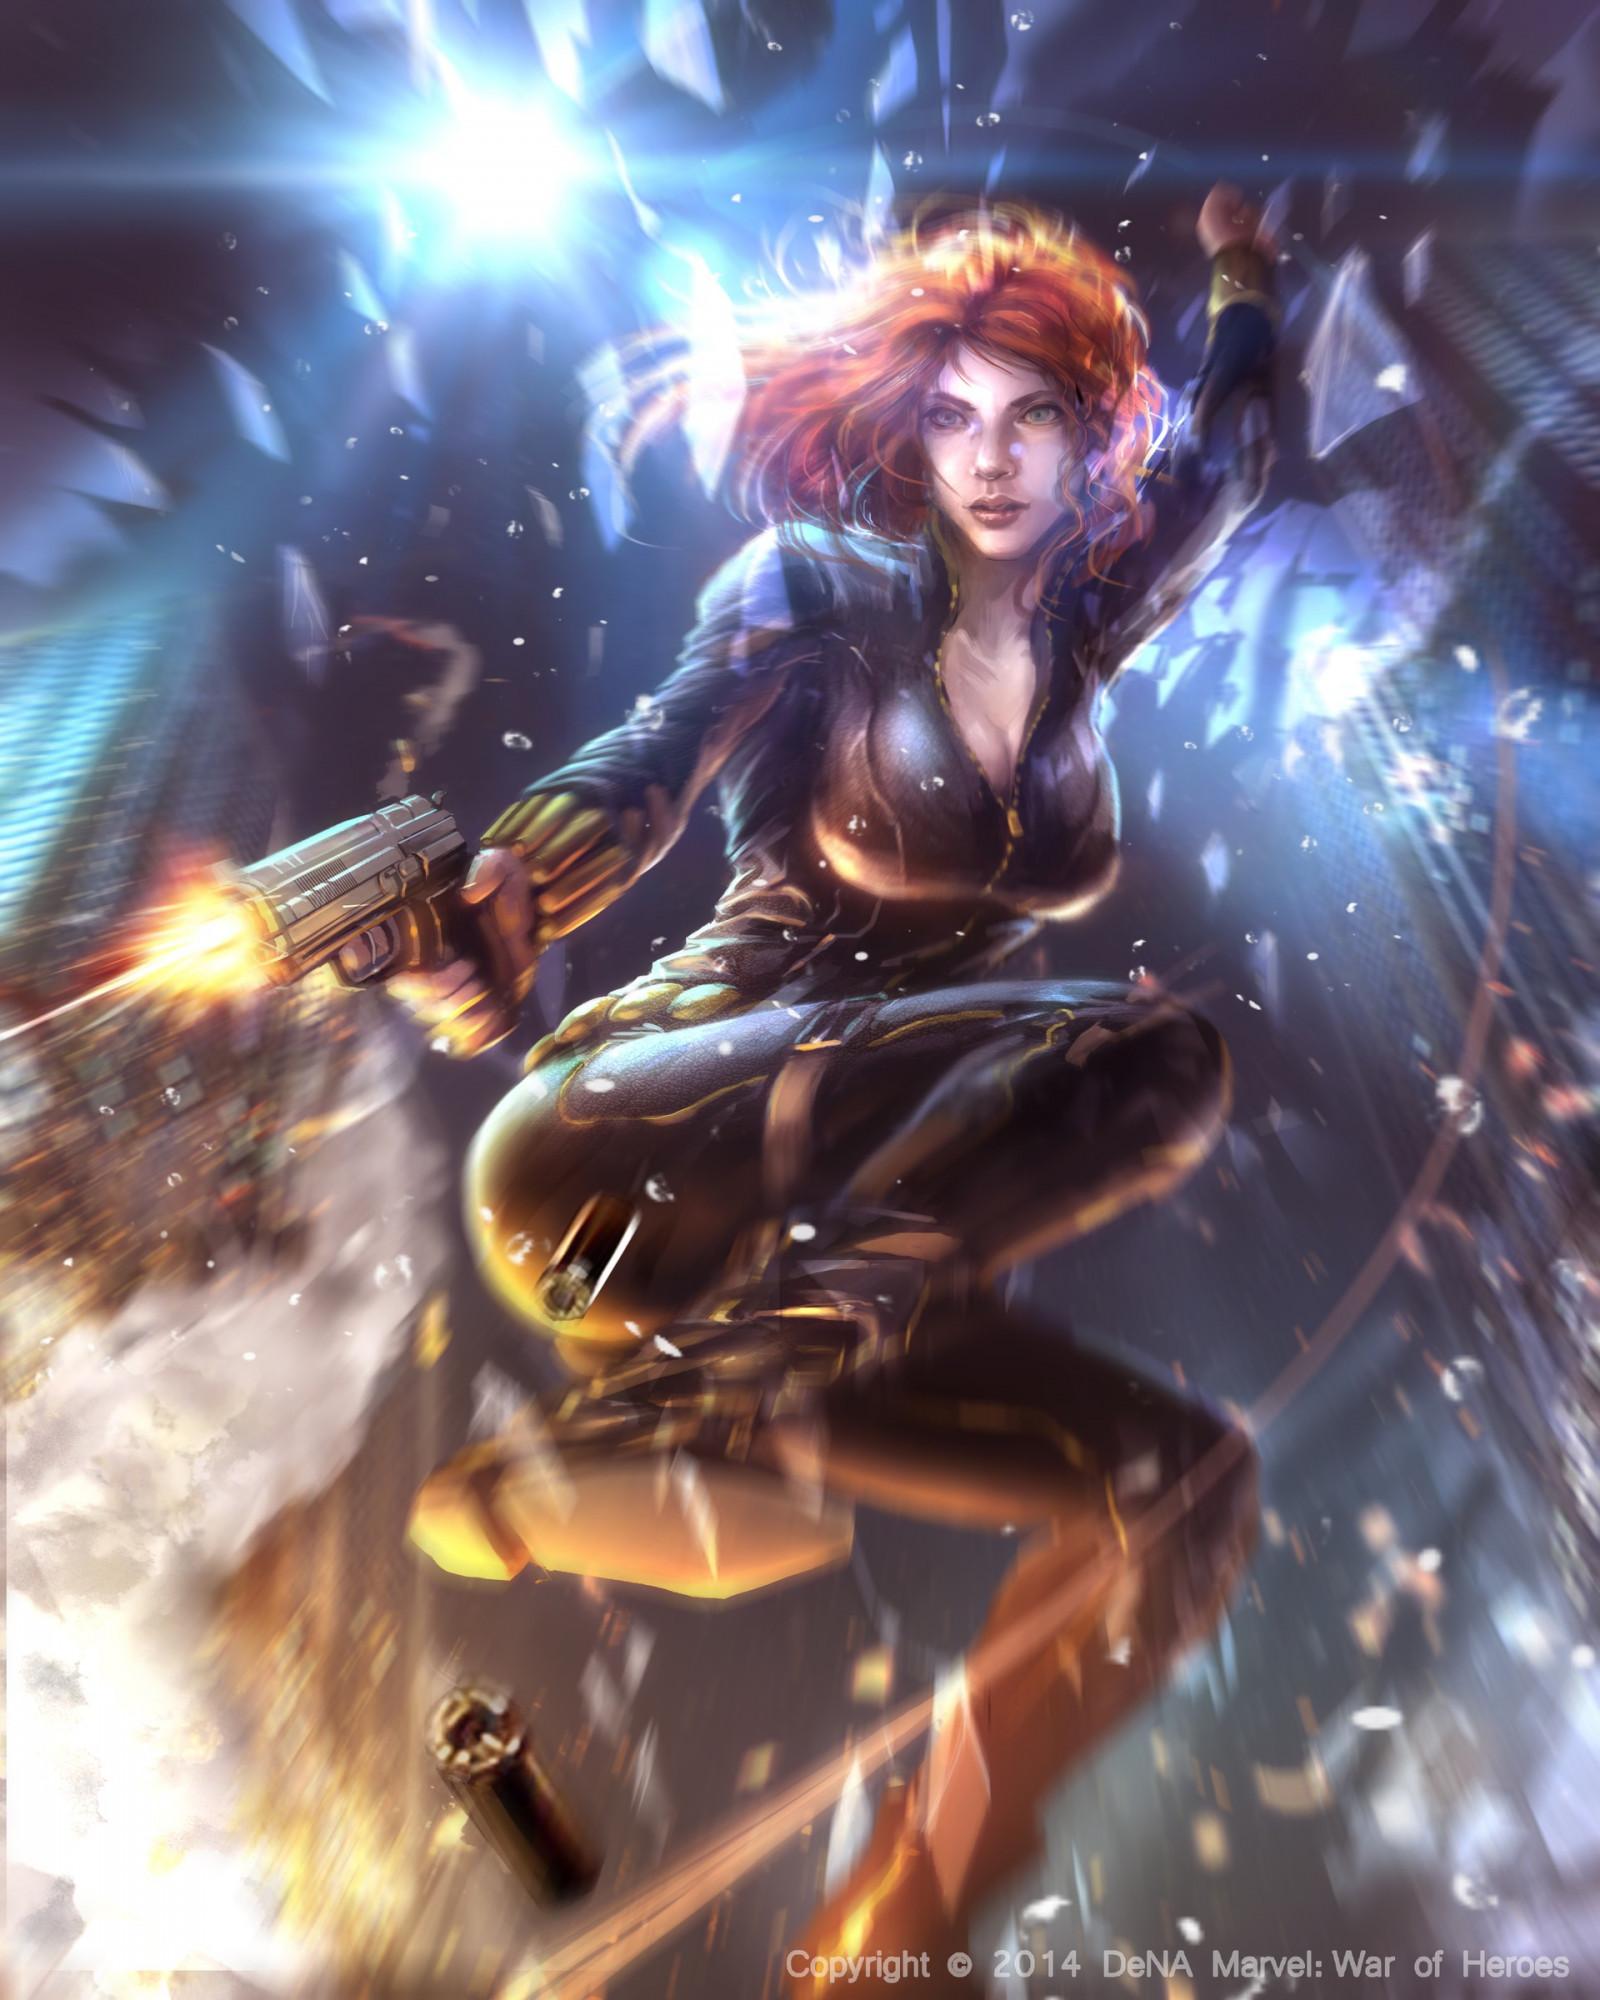 Wallpaper : anime, Black Widow, mythology, screenshot ...